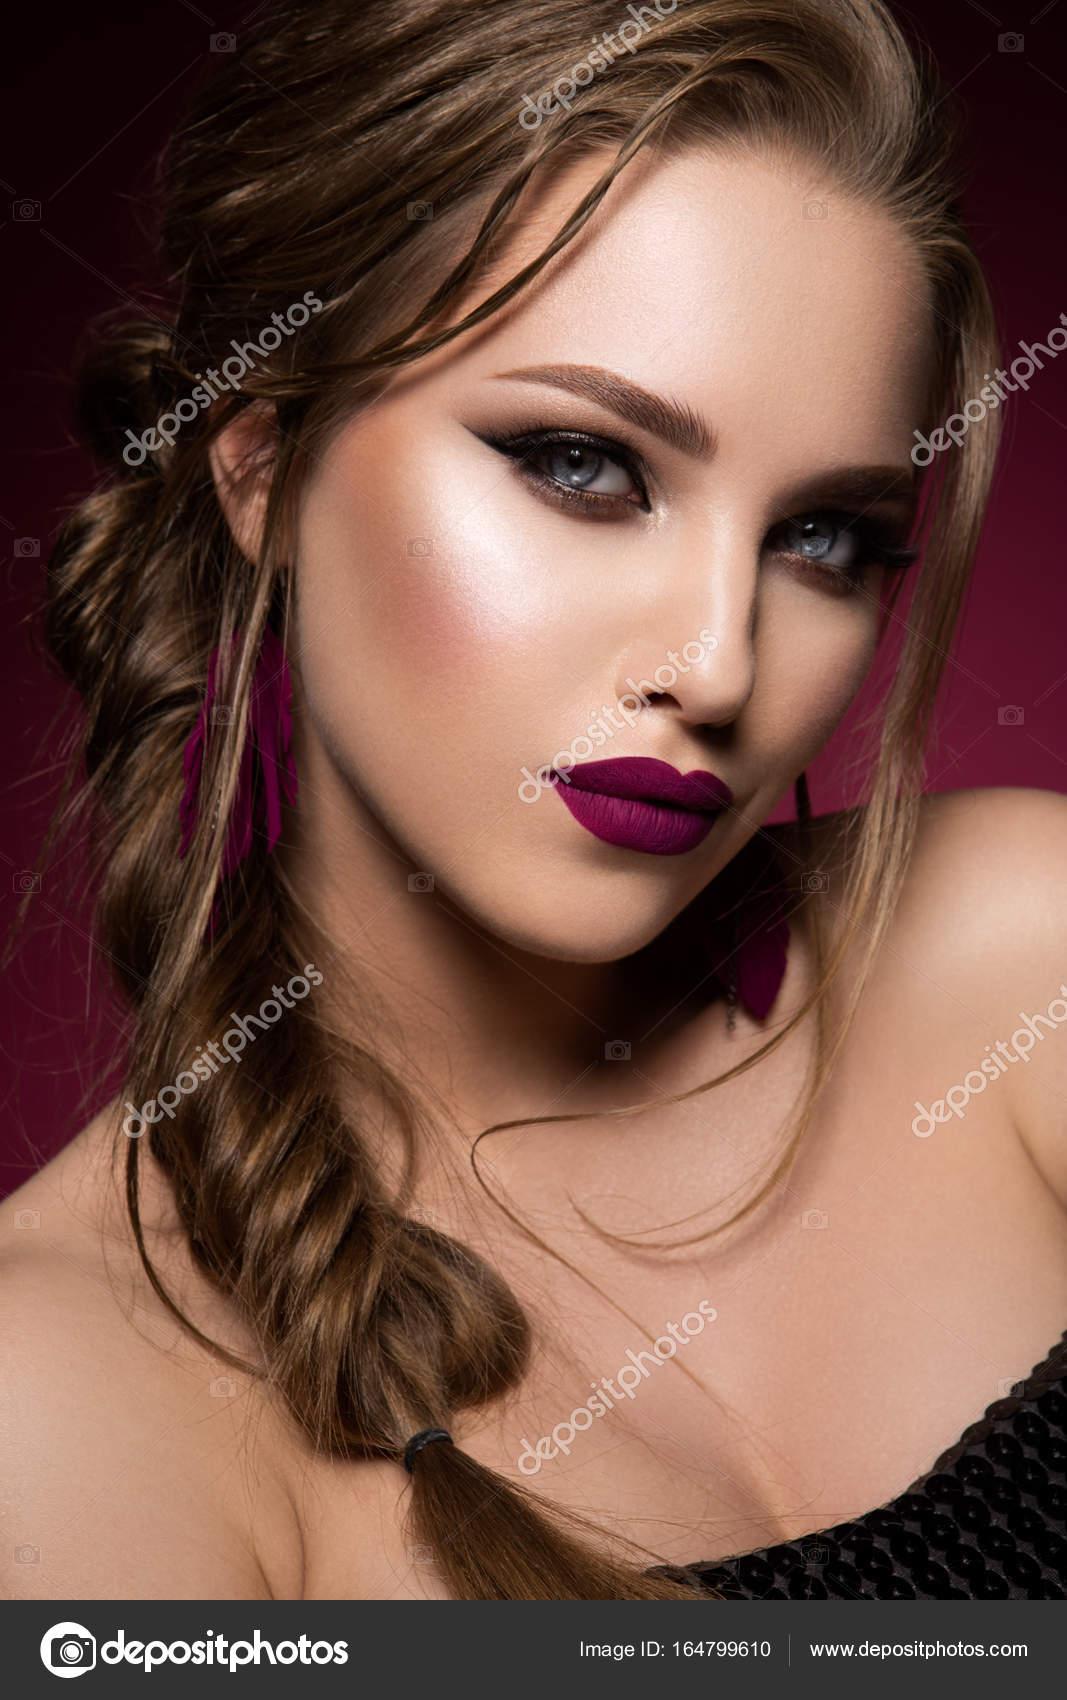 Romantic Hairstyle Stock Photo